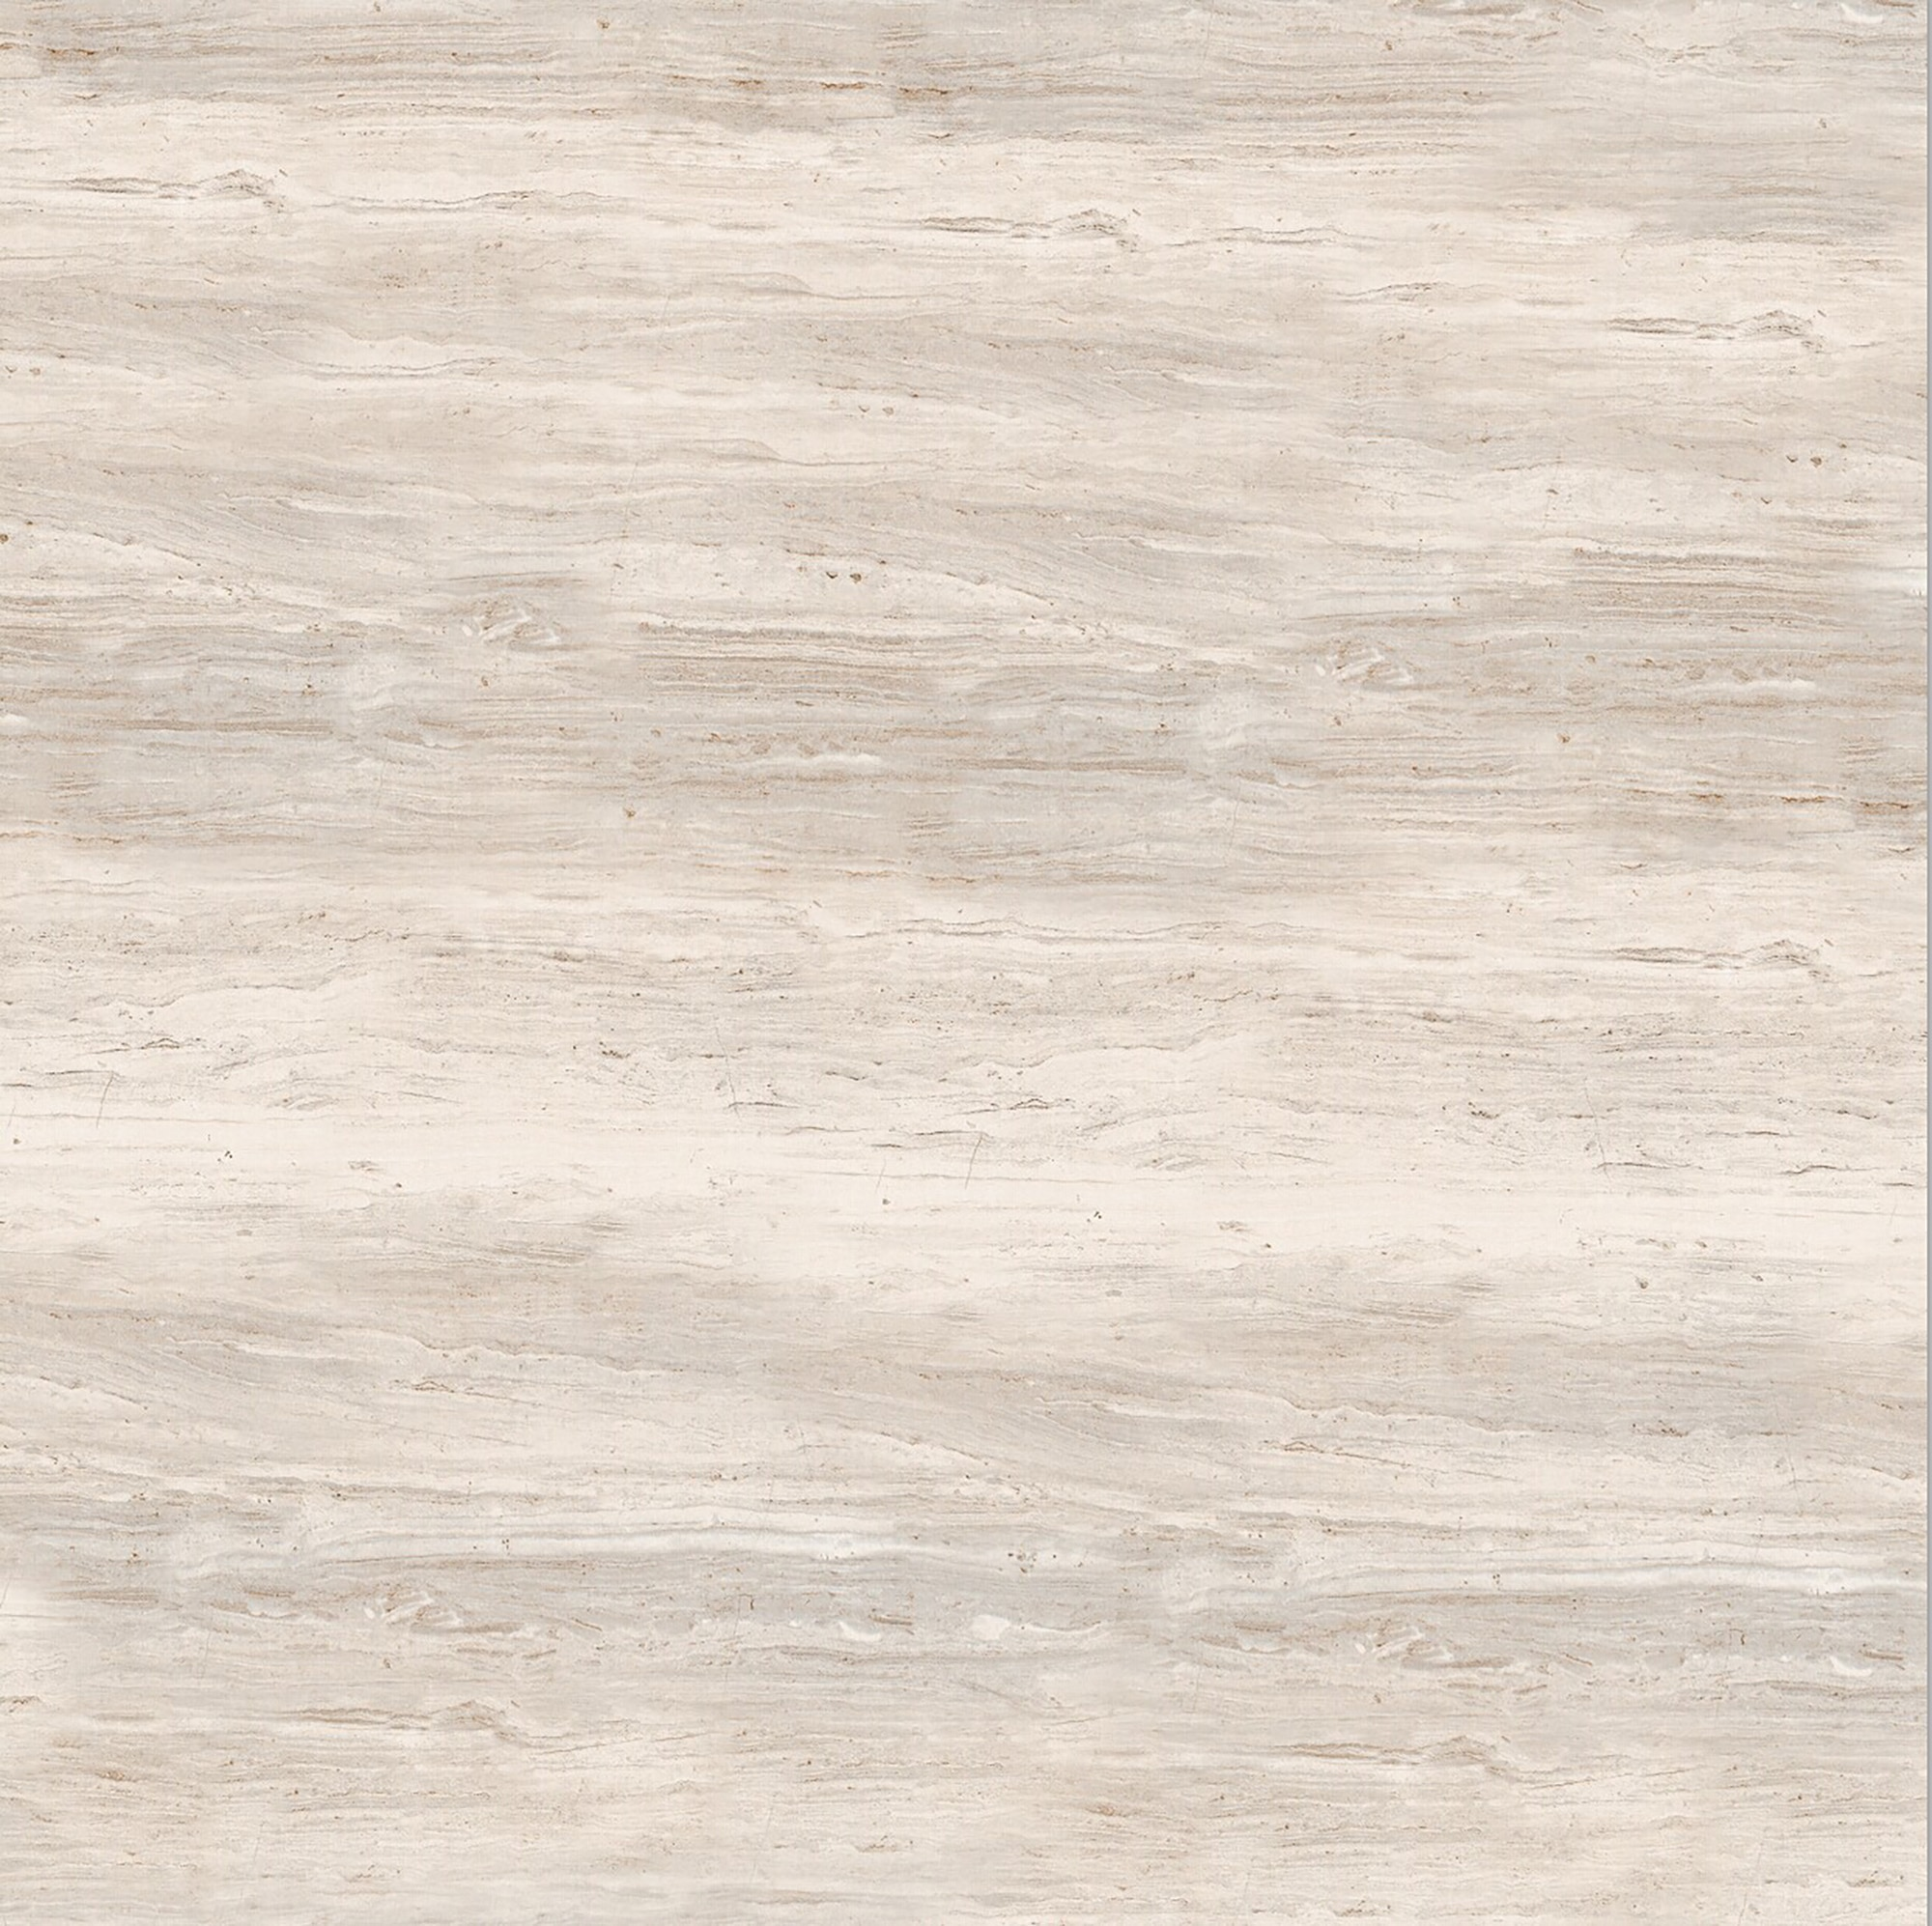 Ceramic & Porcelain Tile Square Tile Wood Grain Look